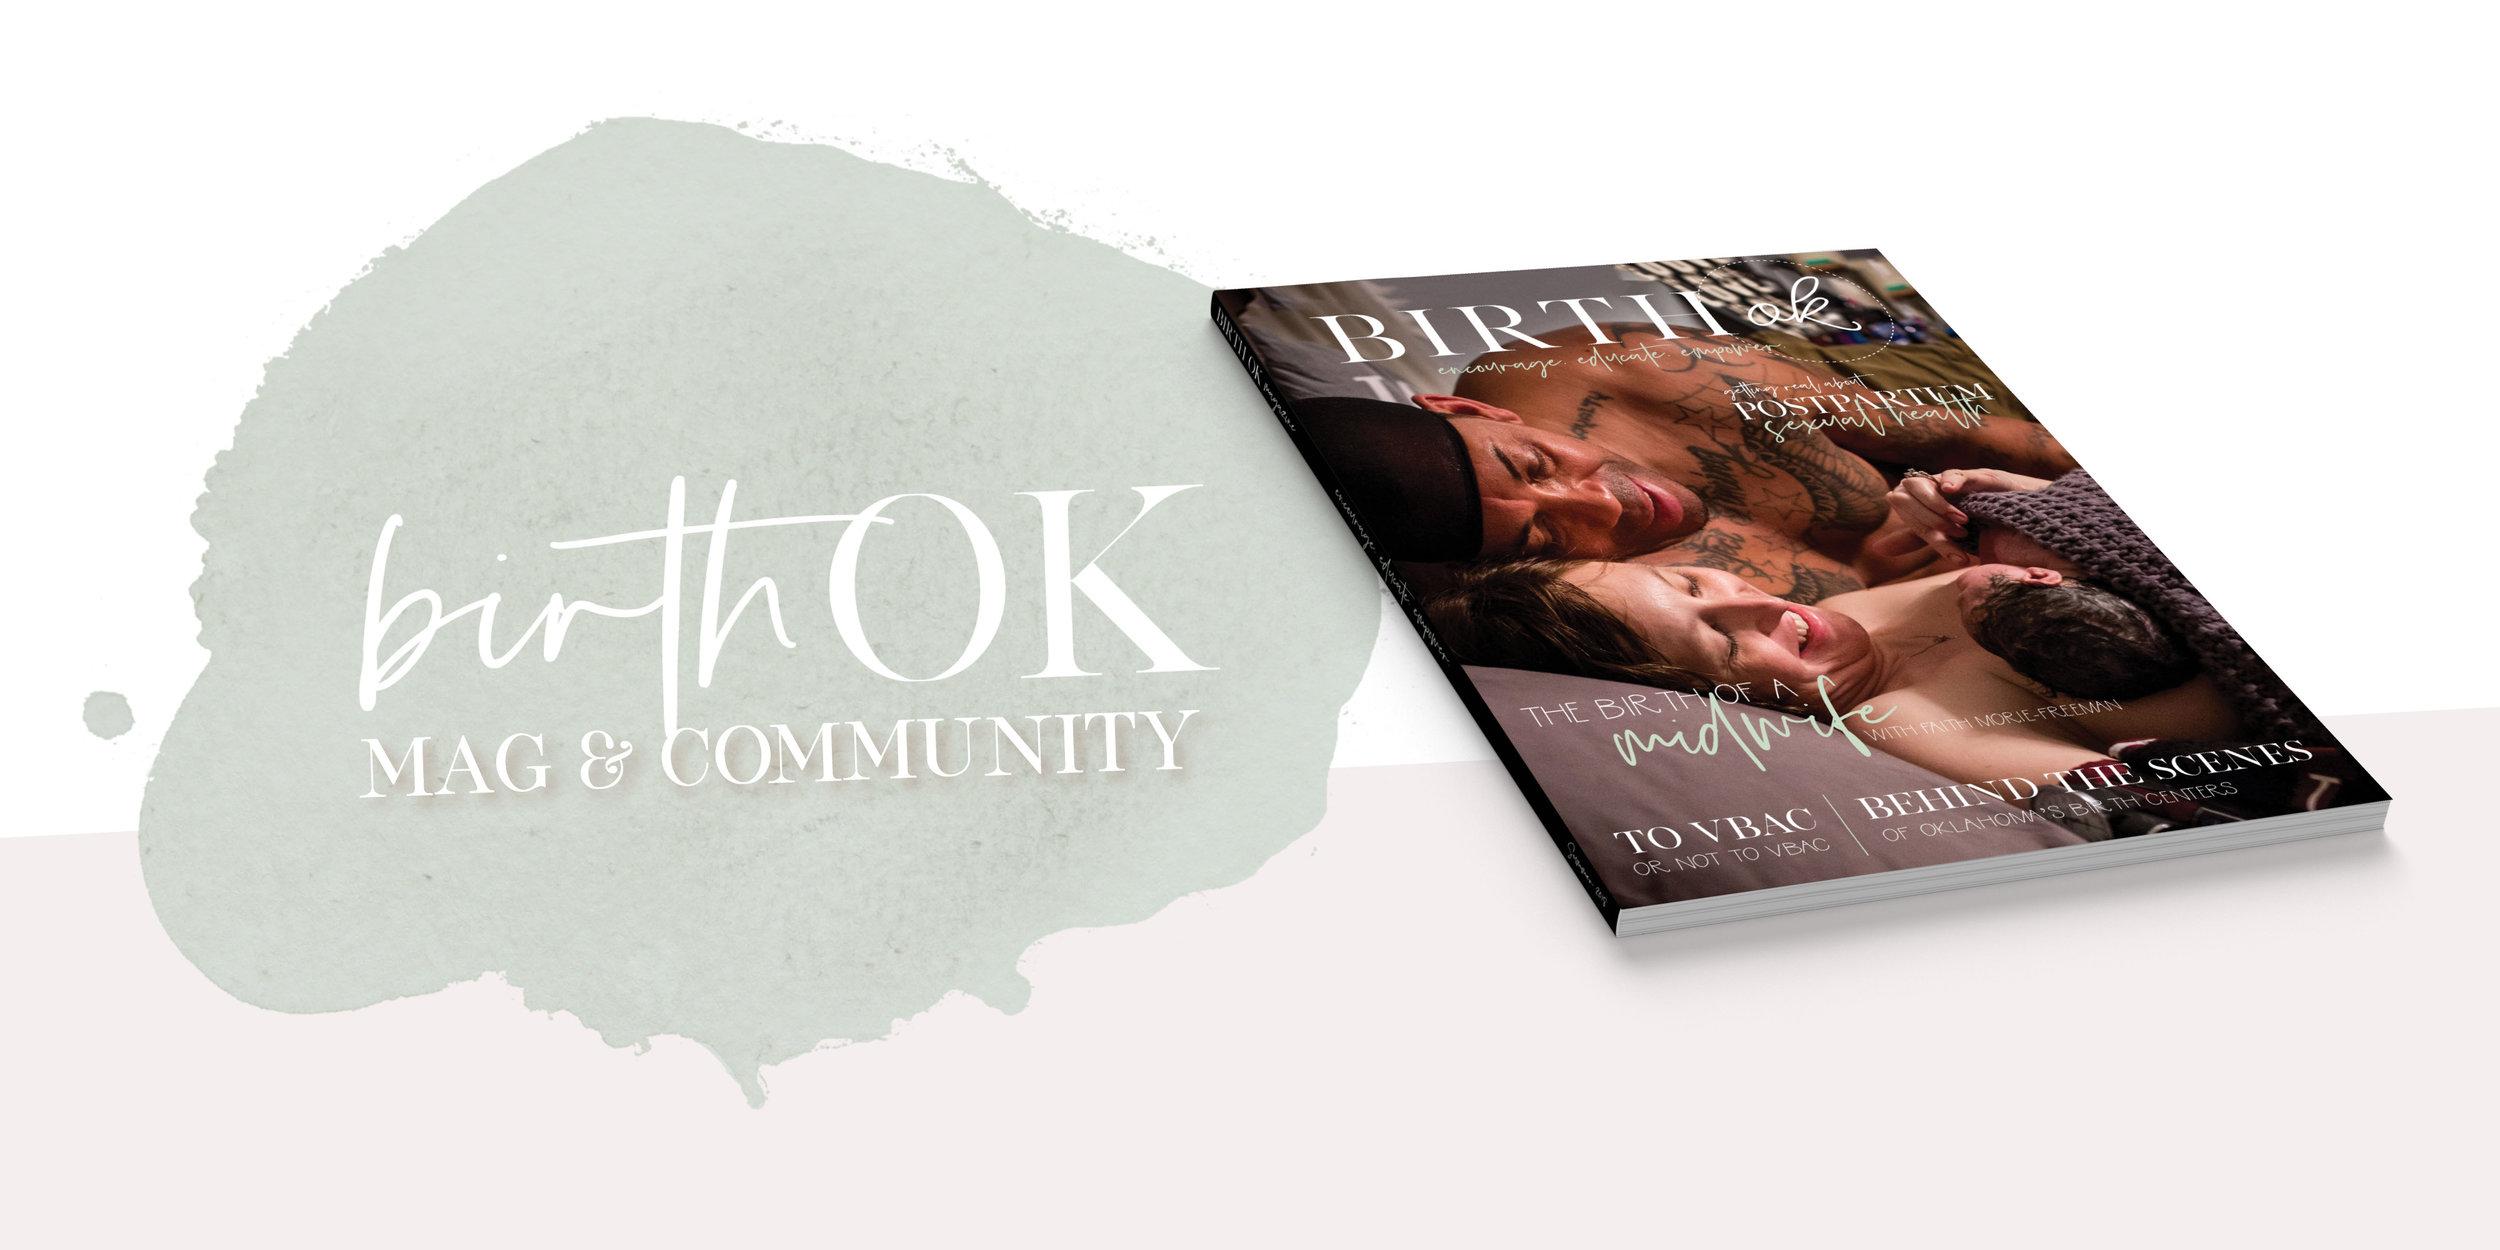 Birth-OK-Oklahoma-Birth-Community-Resource-and-Magazine.jpg